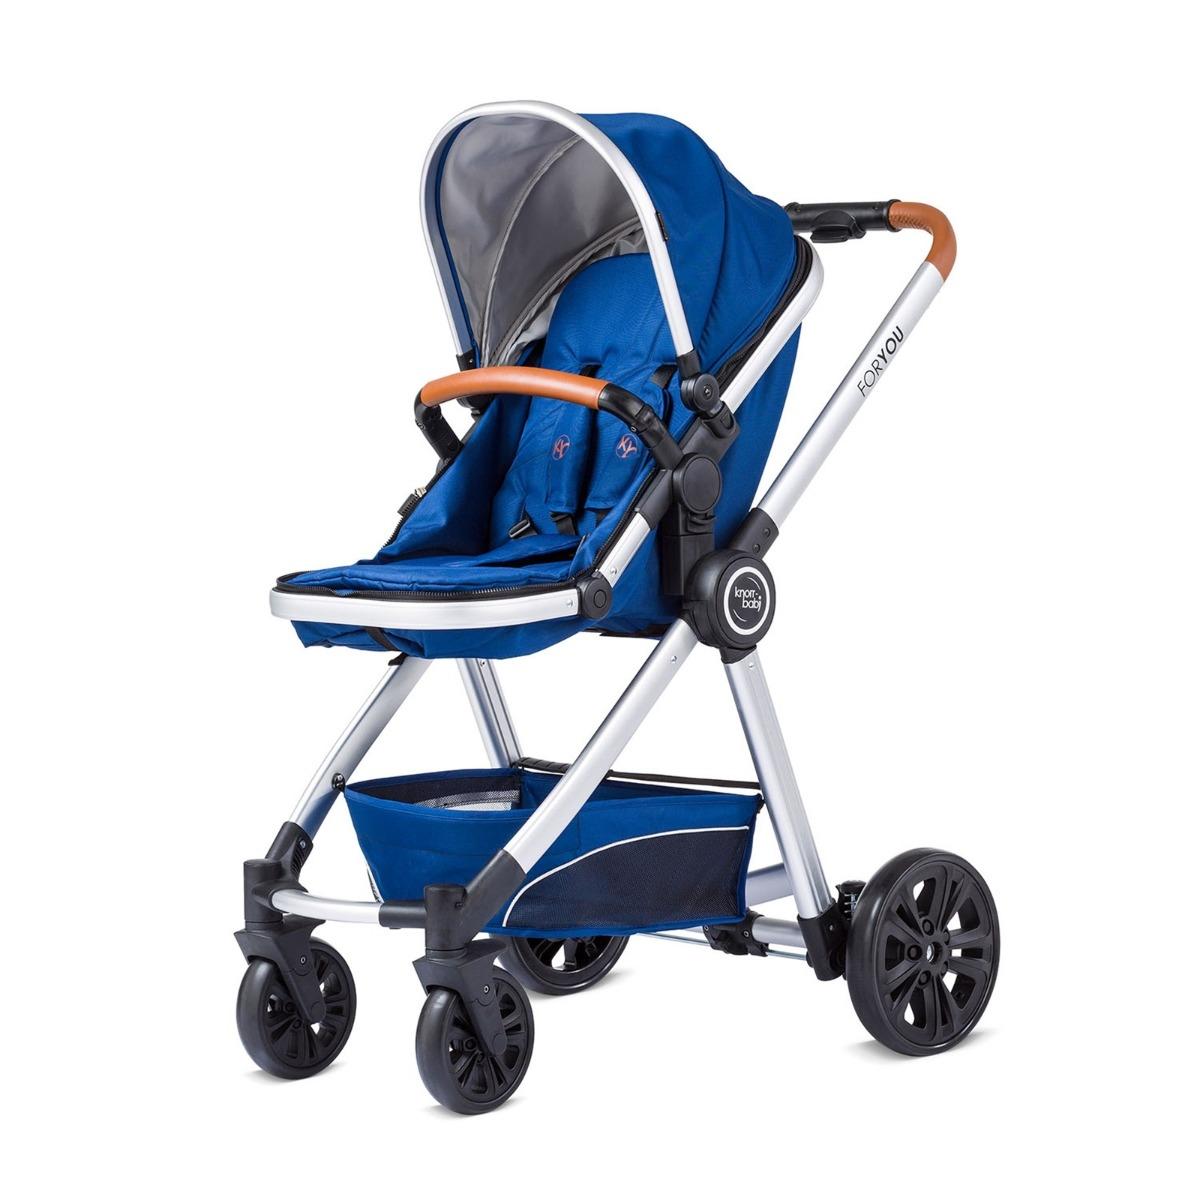 Carucior 2 in 1 Combi-Vagon For You Knorr, Albastru